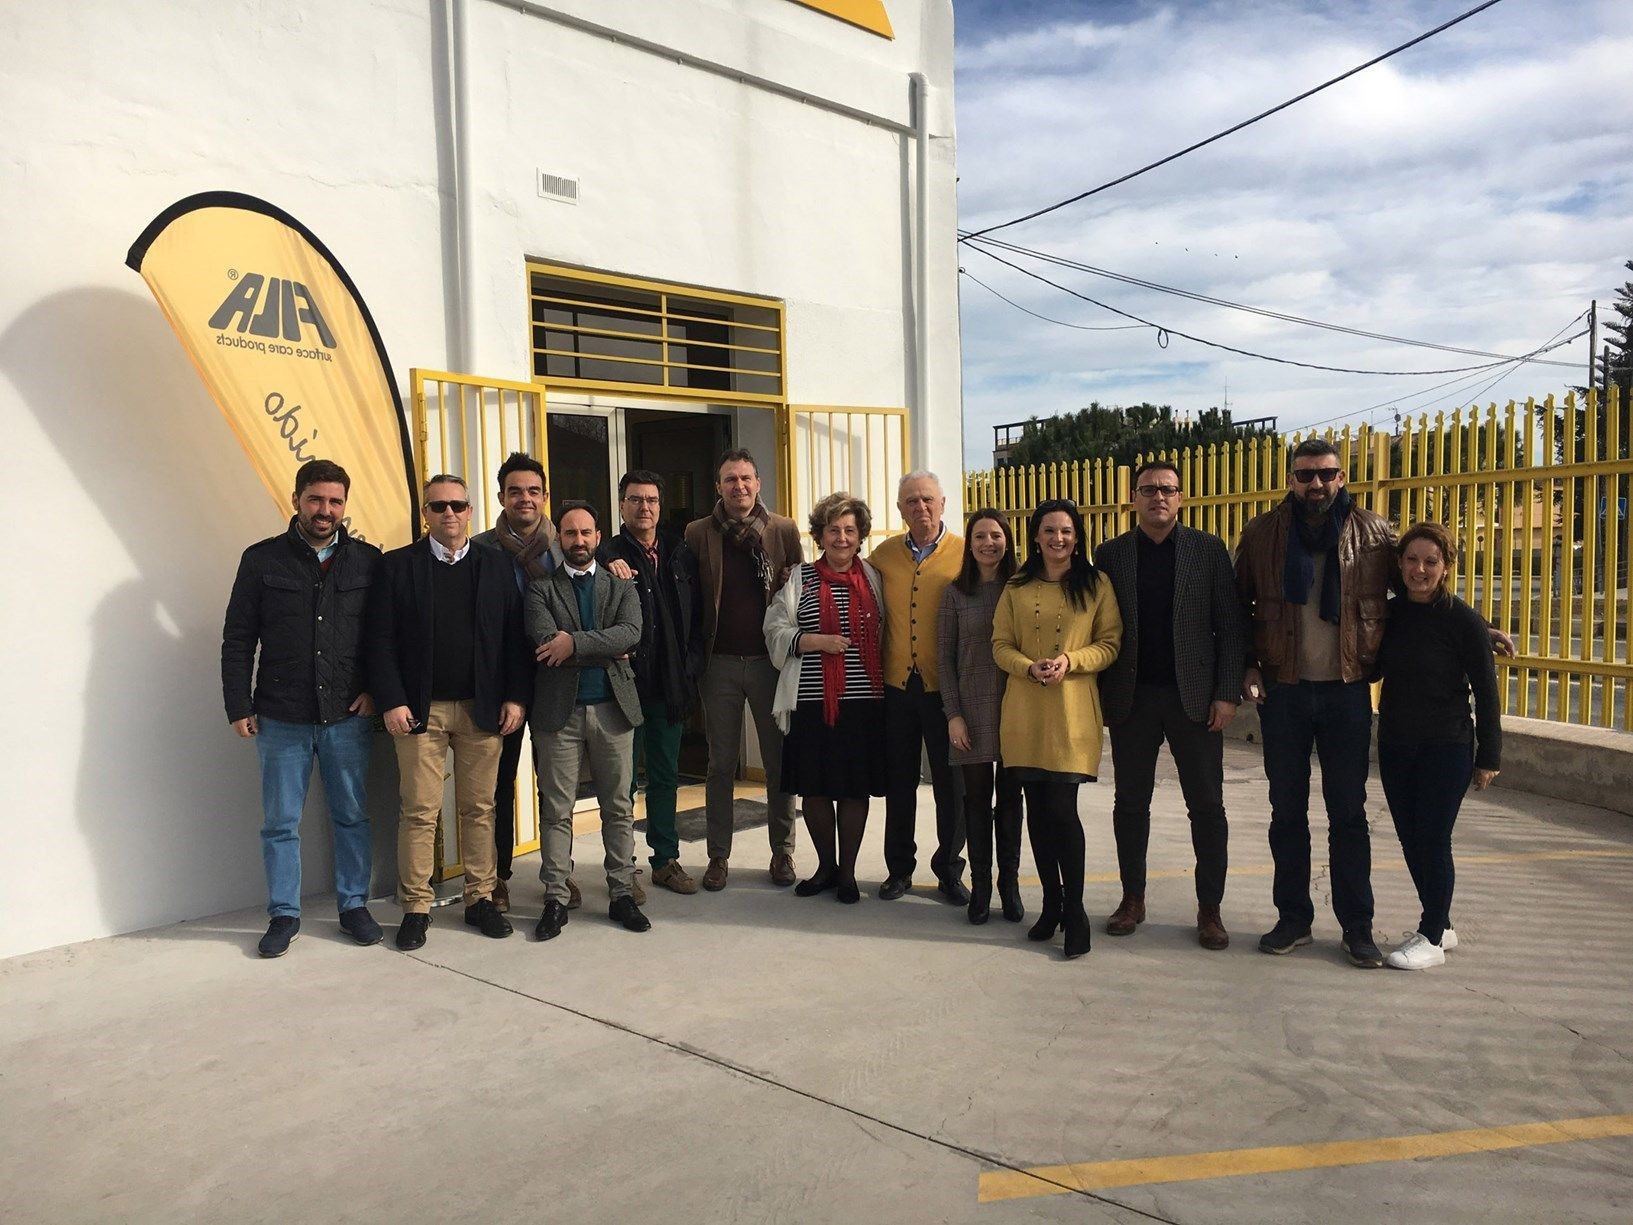 FILA España, 25 anni di successi